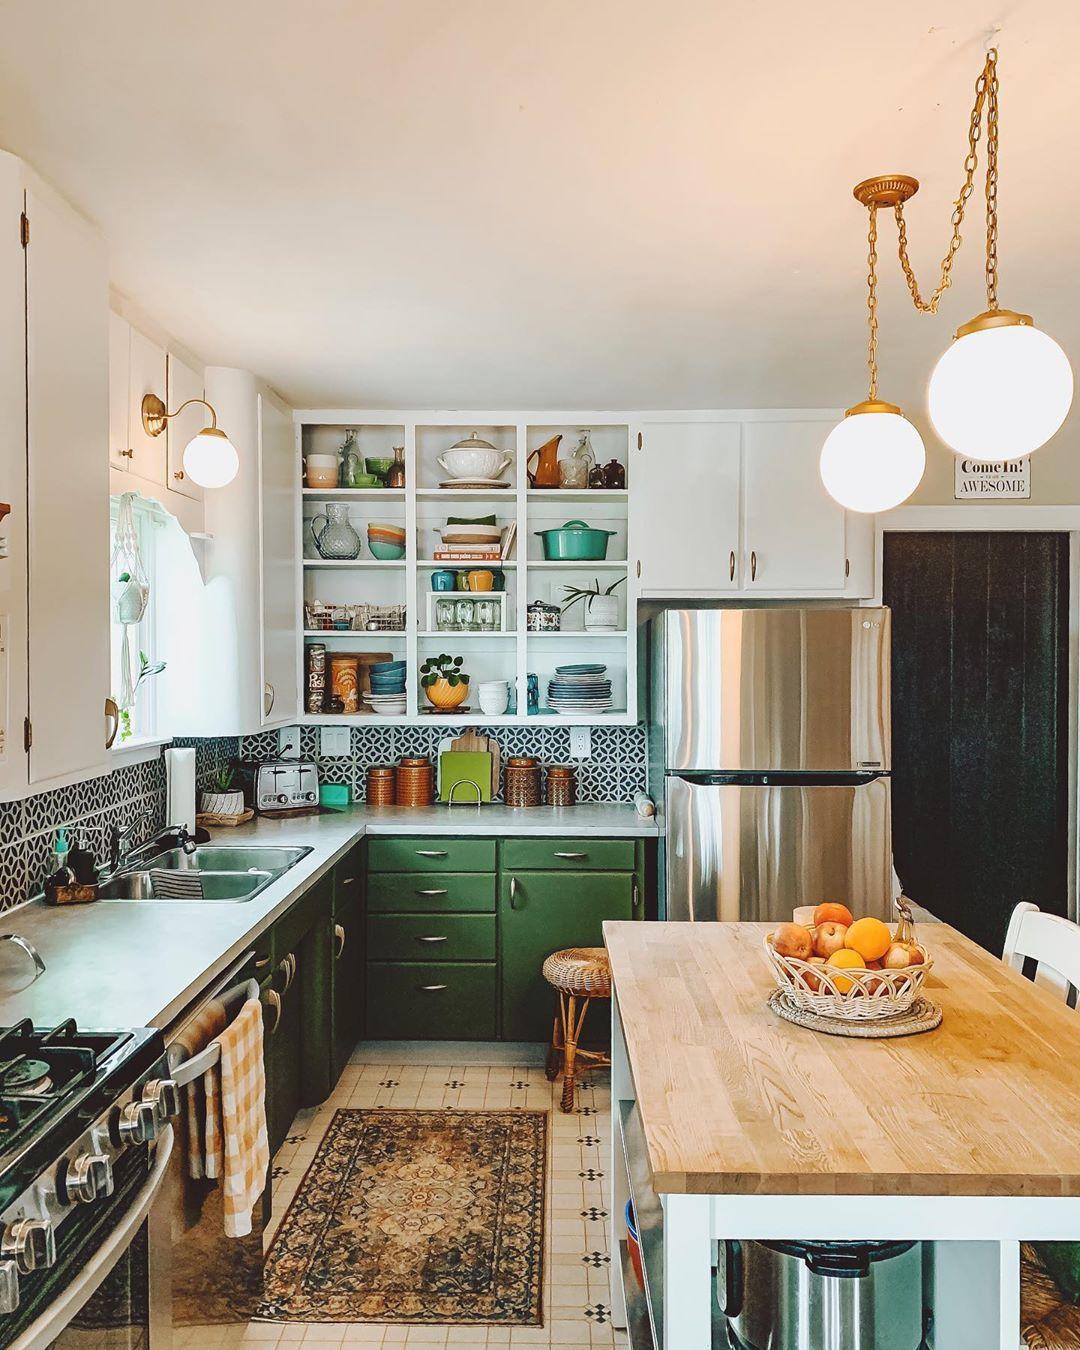 50 Small Kitchen Ideas And Designs: 12 1950s Kitchen Ideas